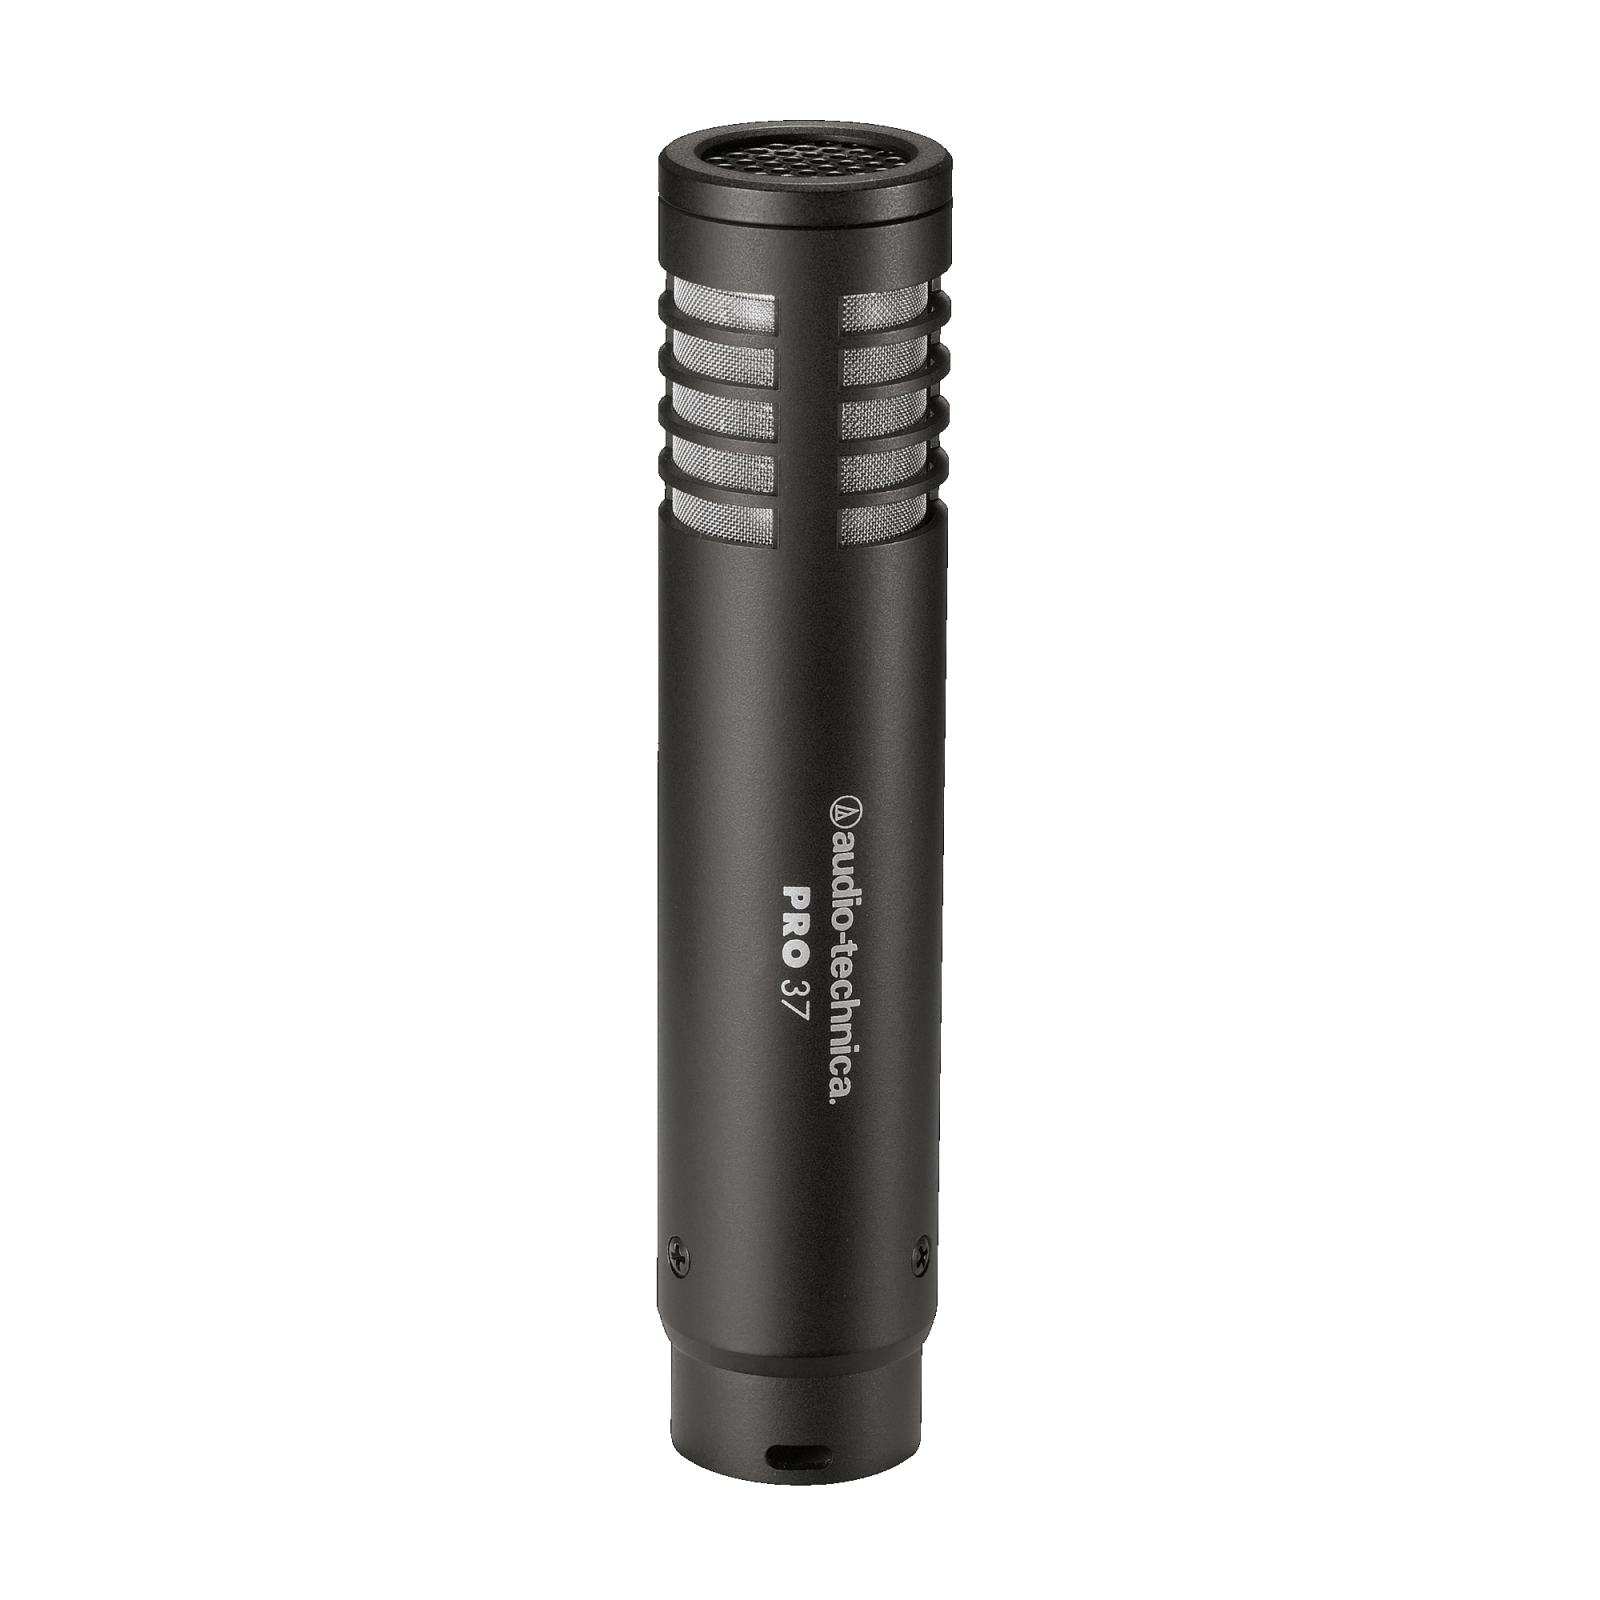 Audio Technica PRO 37 Cardioid Condenser Microphone